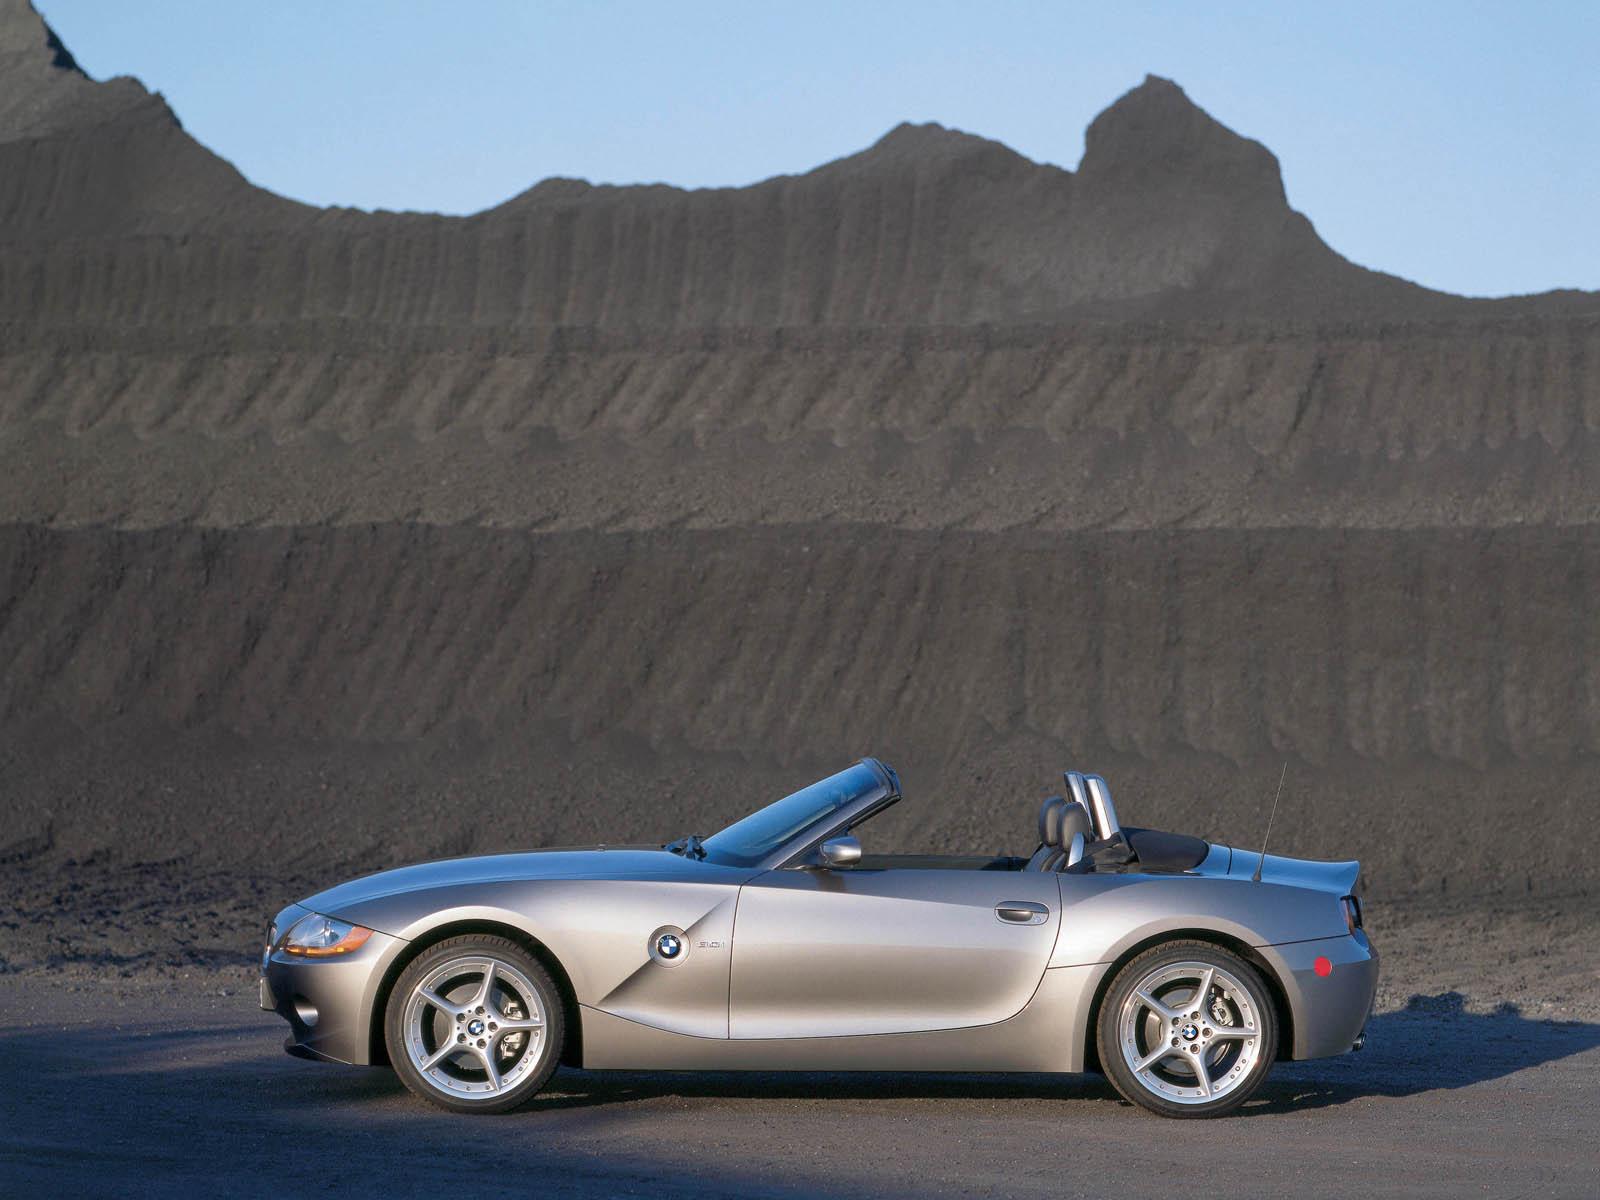 BMW宝马Z4汽车图片专辑20张